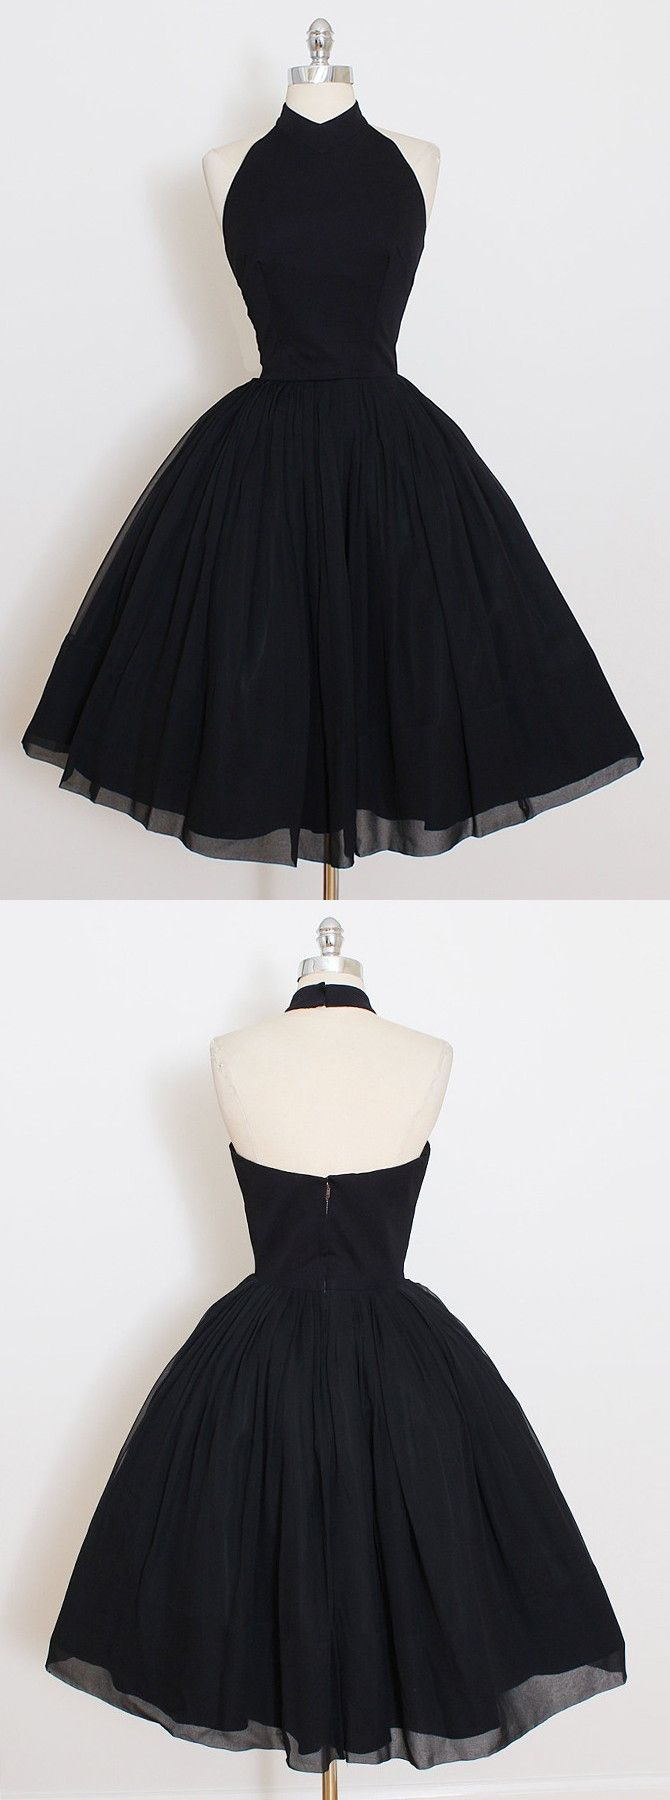 short homecoming dresses,black homecoming dresses,short prom dresses,simple homecoming dresses @simpledress2480